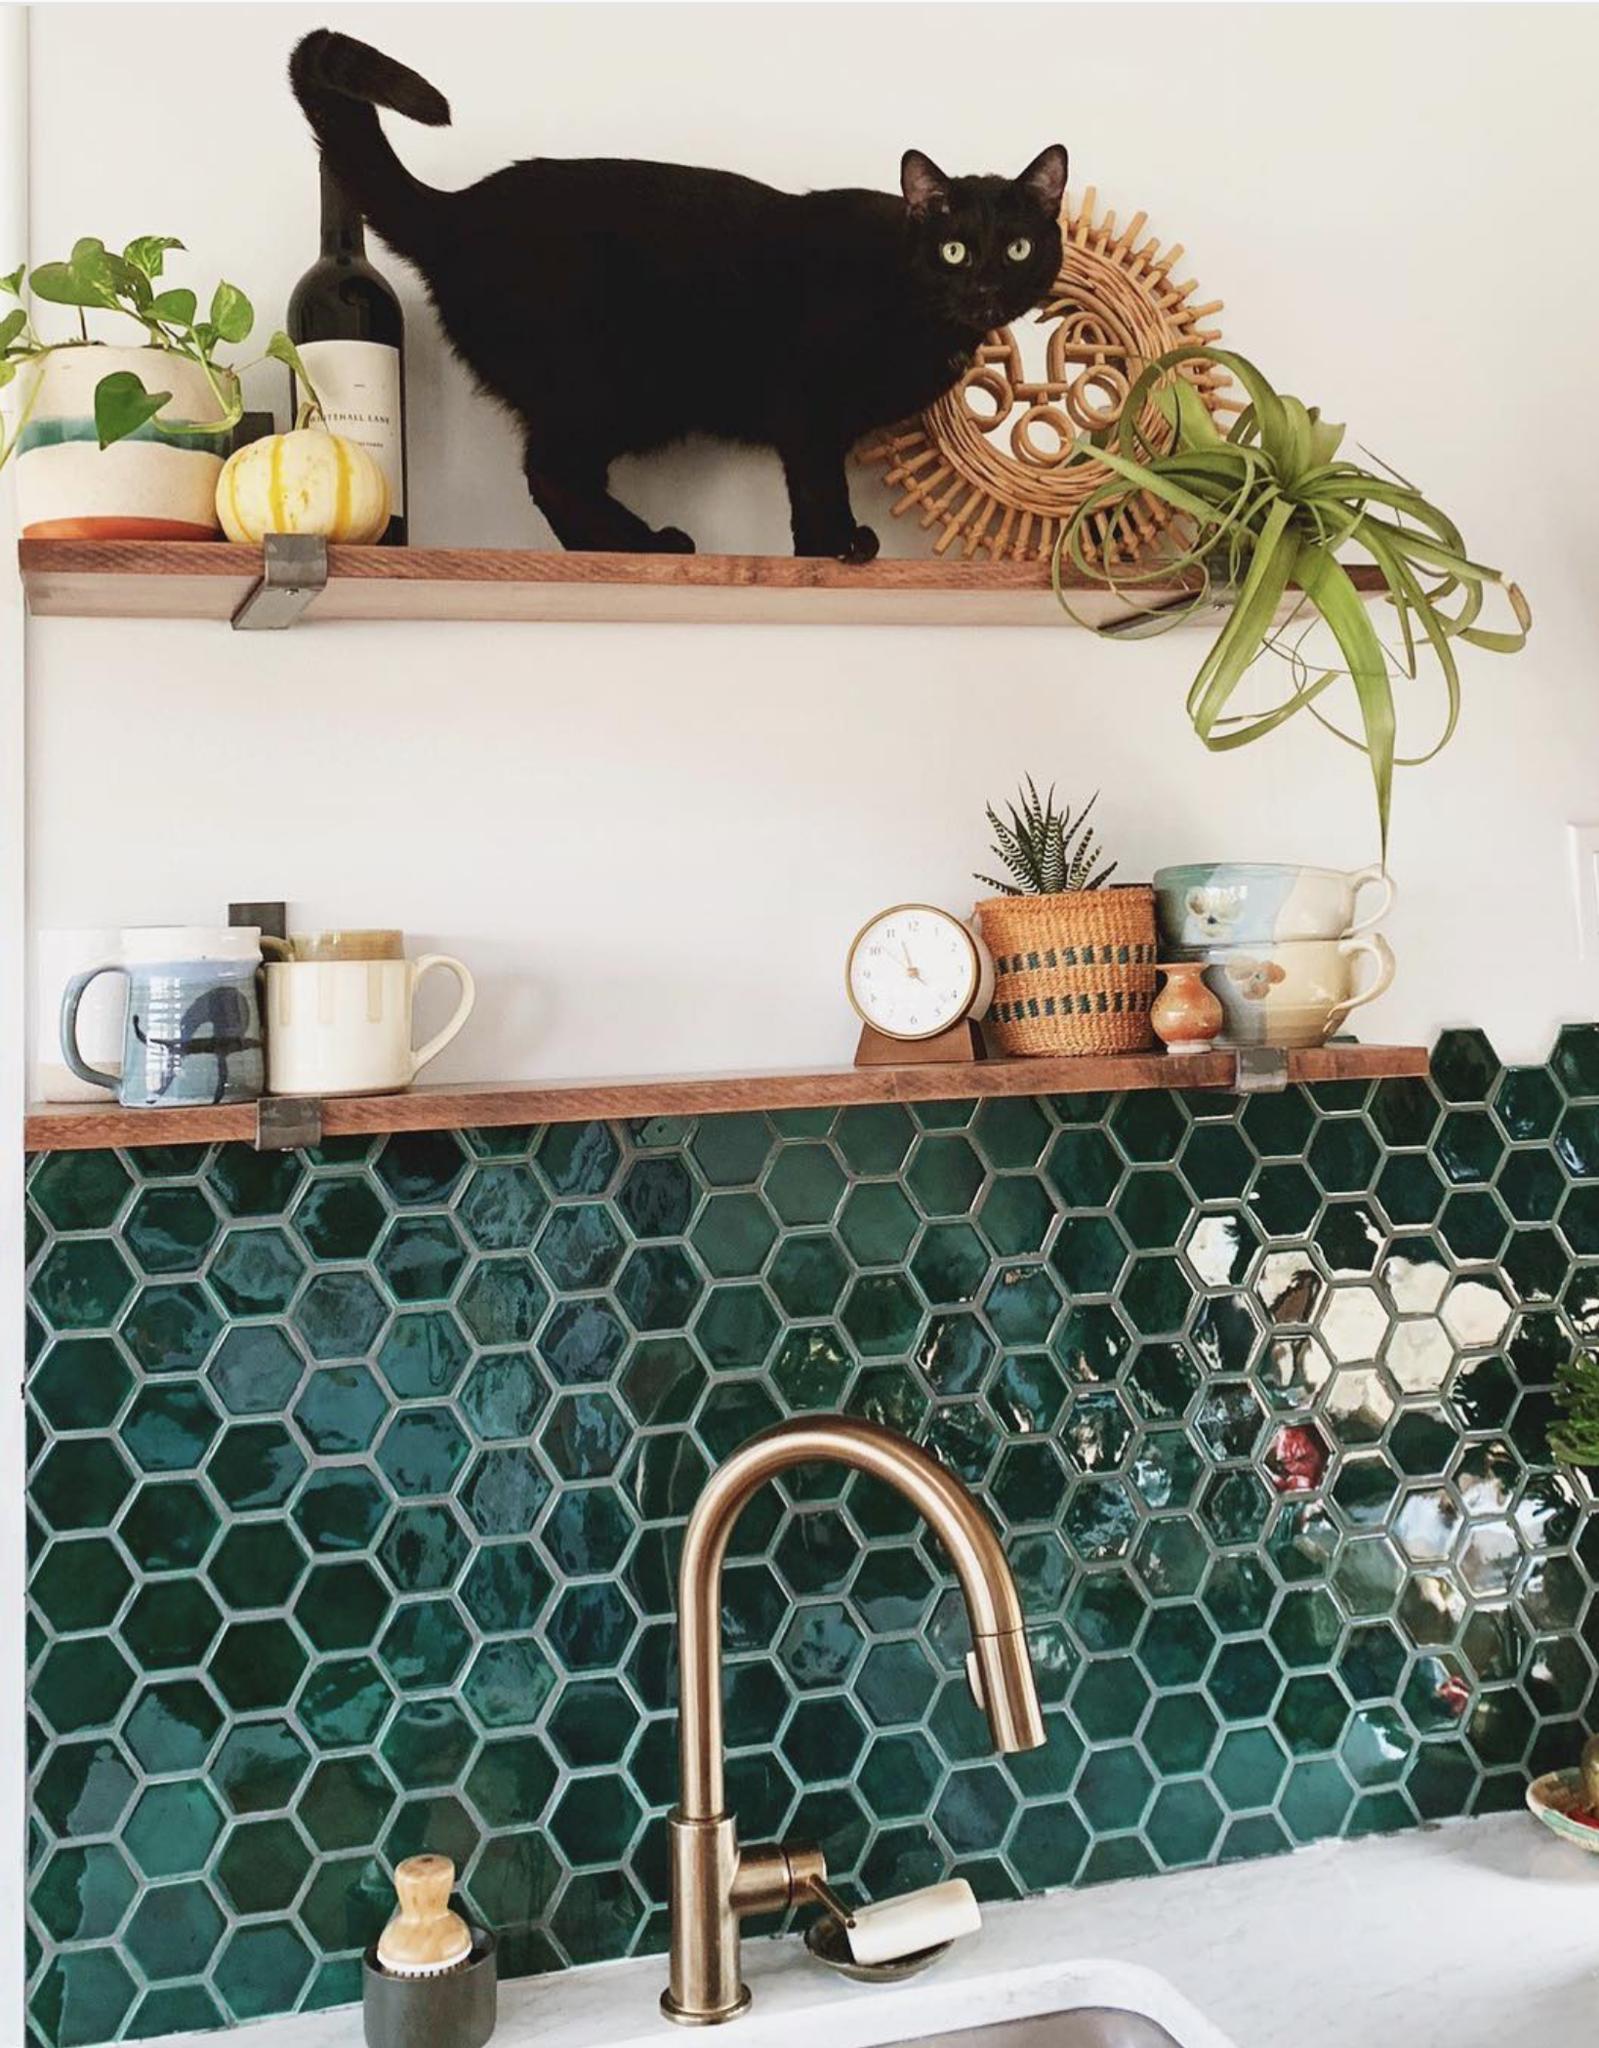 11 Kitchen Backsplashes To Wow Your Guests Kitchen Tiles Design Hexagon Tile Backsplash Kitchen Tiles Backsplash